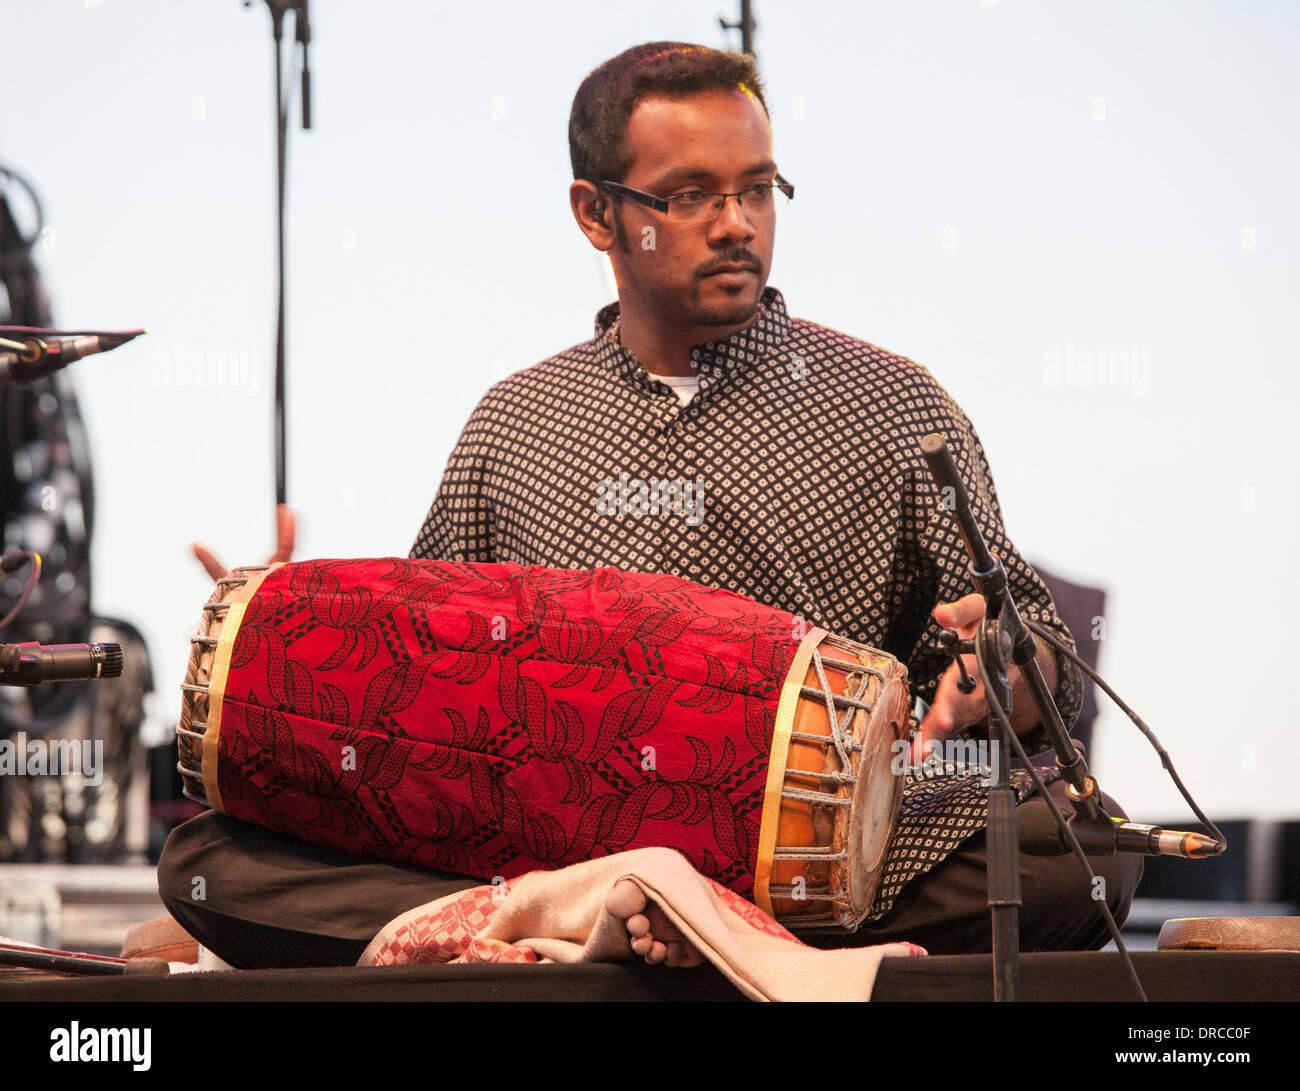 A band member playing for Anoushka Shankar performing at Jazz A Juan Festival  Nice, France - 15.07.12 - Stock Image